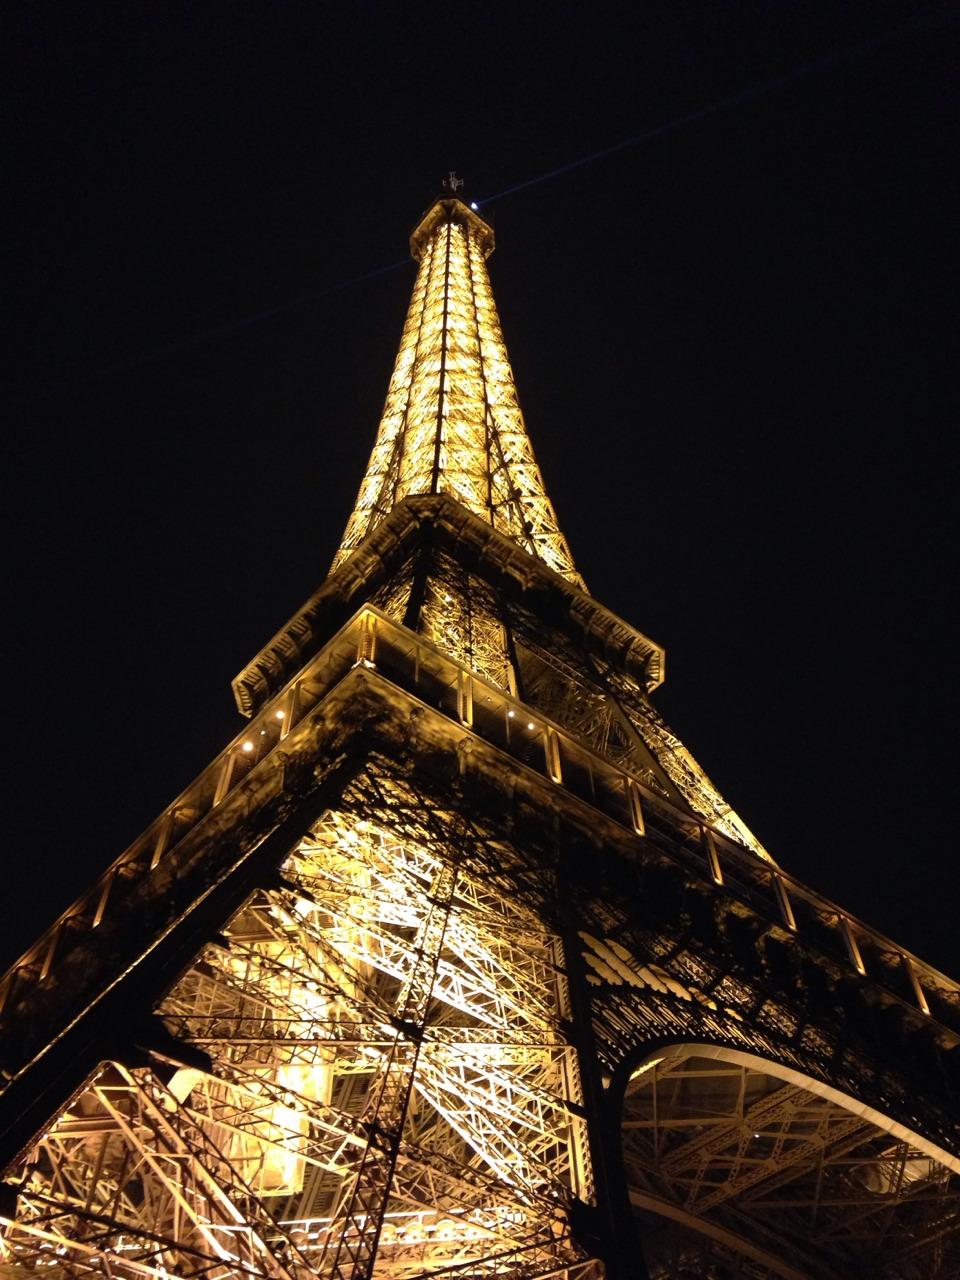 Sweet tower or something